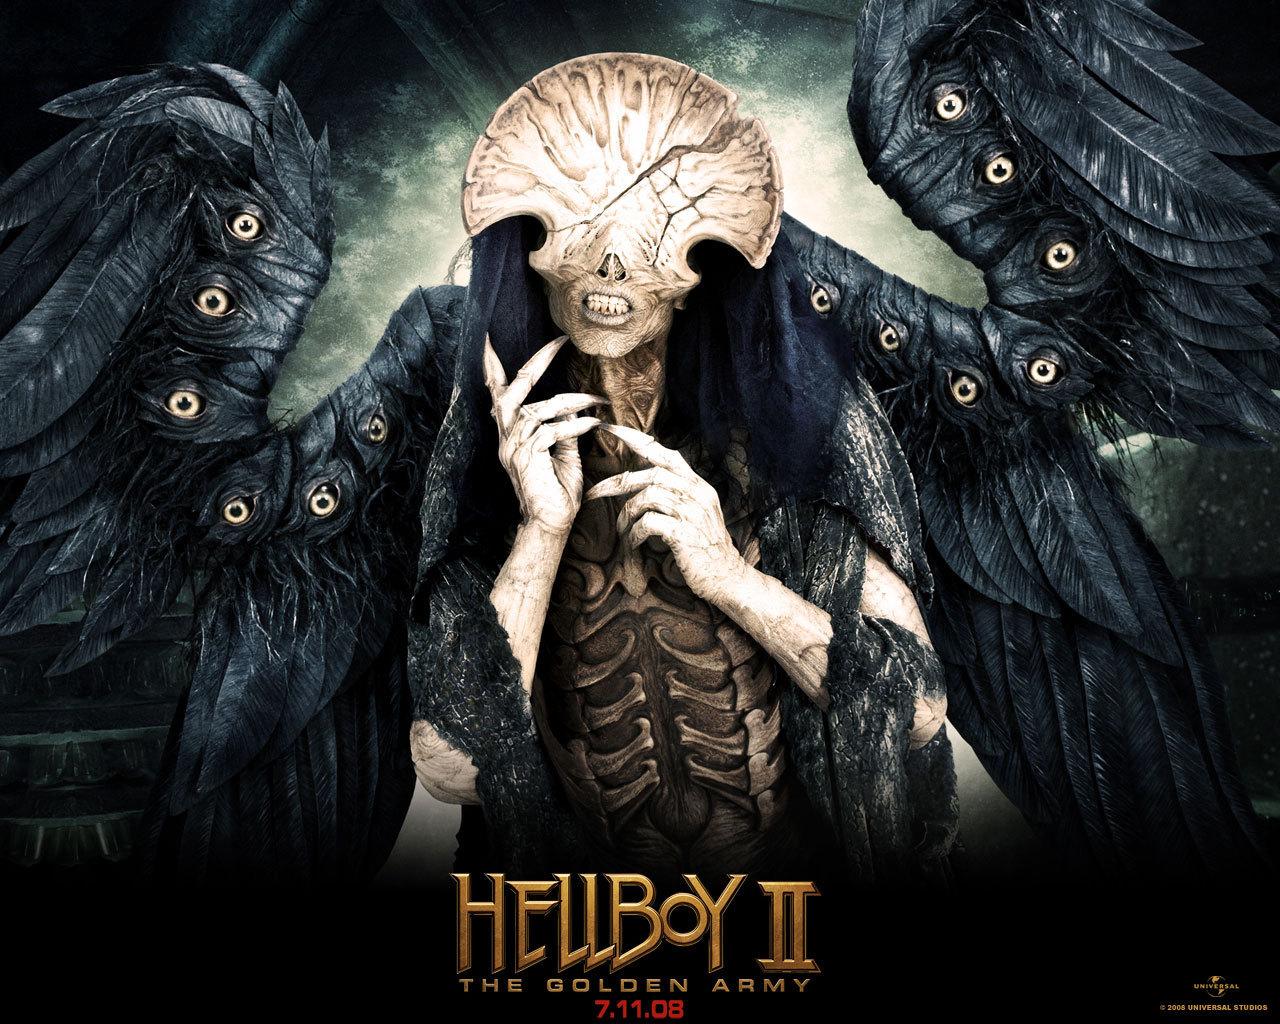 Villains Angel of Death (villian)